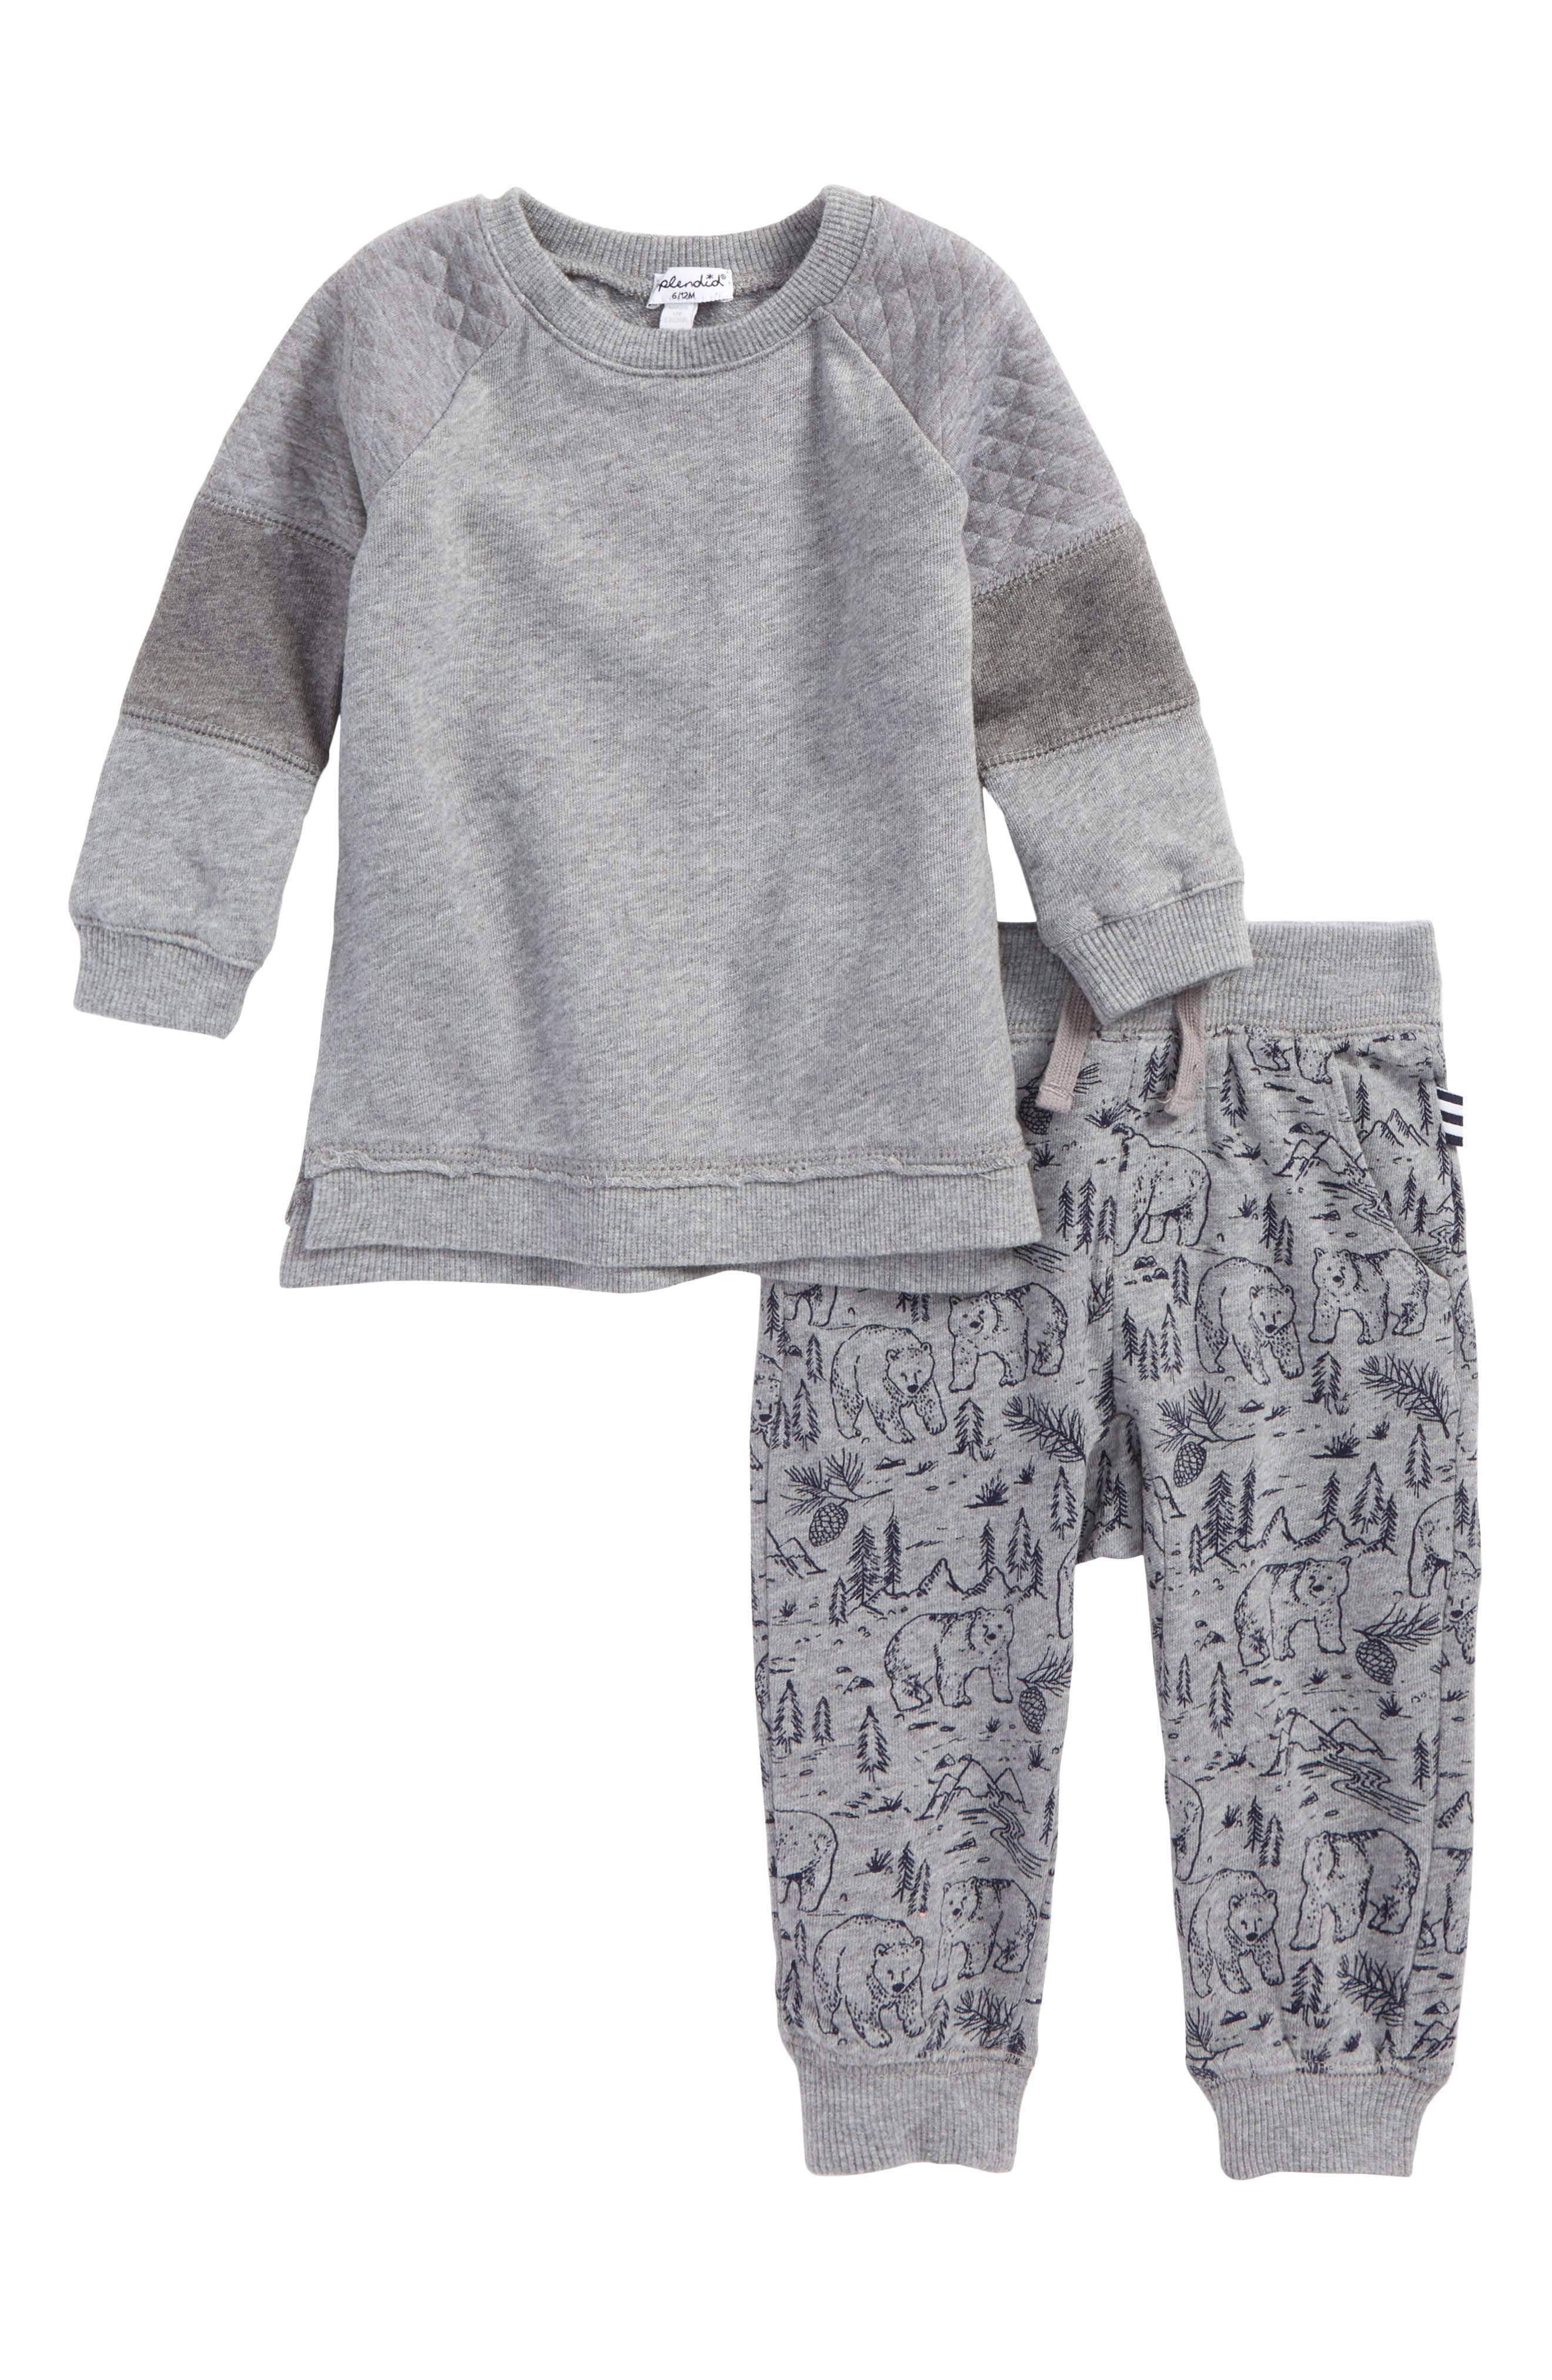 Main Image - Splendid Sweatshirt & Sweatpants Set (Baby Boys)